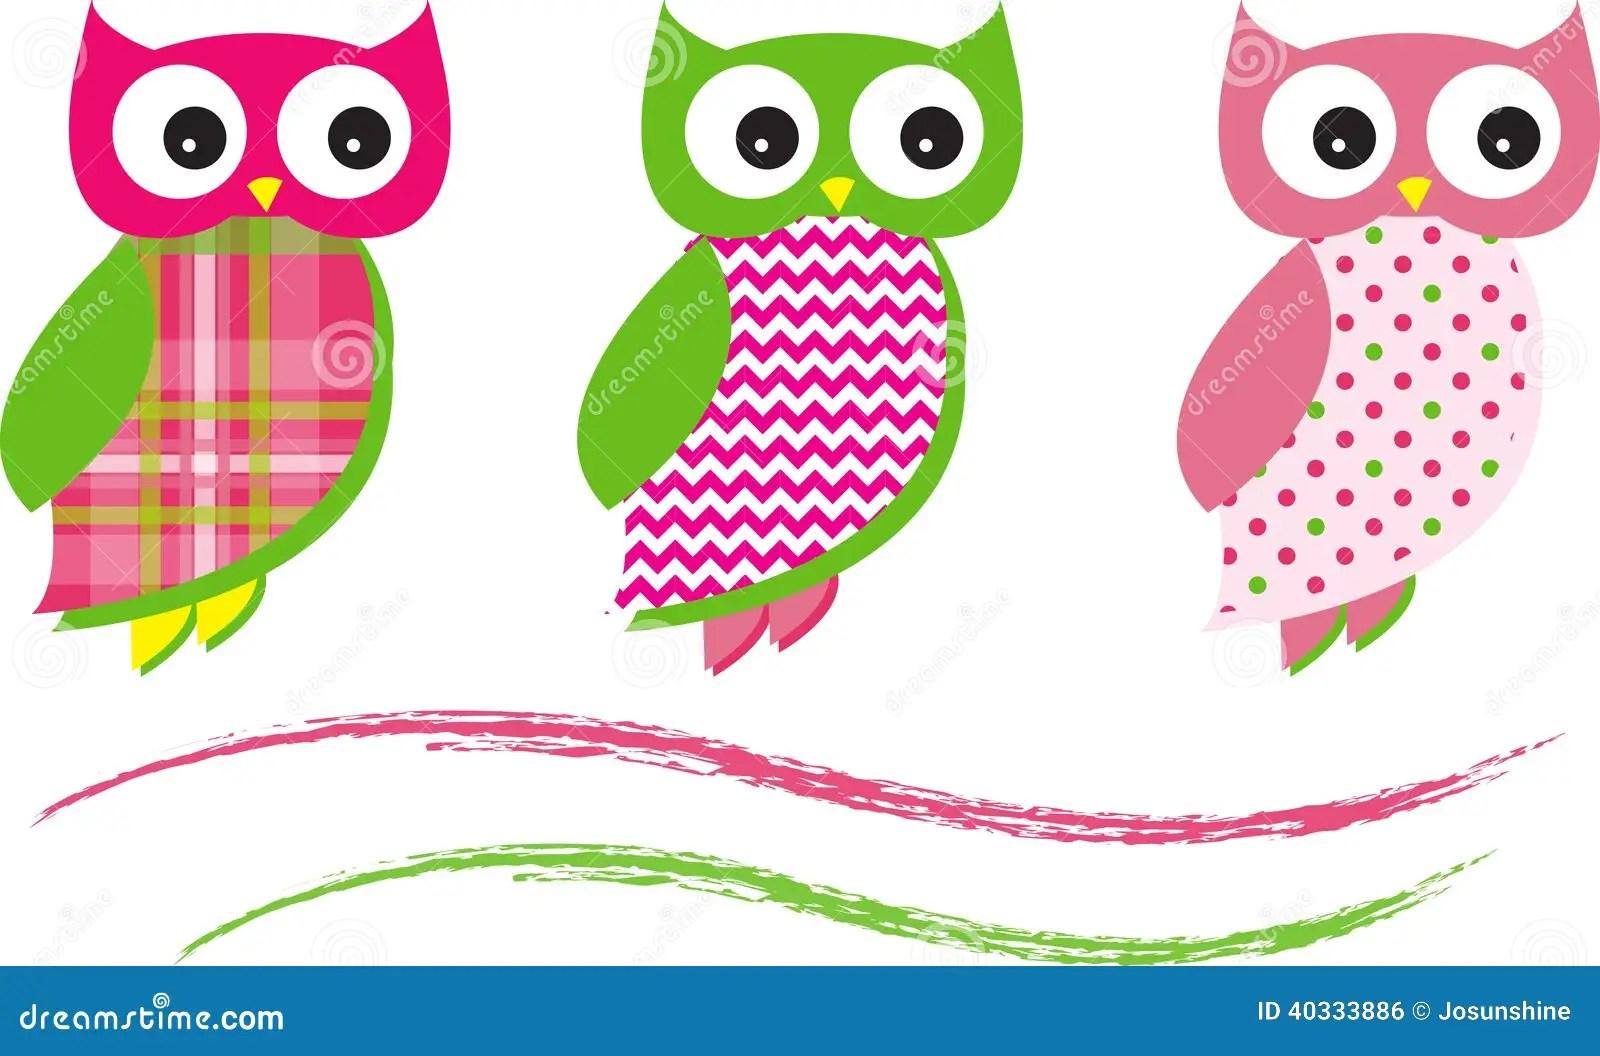 Cute Owl Cartoon Wallpaper Vector Cute Owl Cartoon Vector Cartoondealer Com 13180333